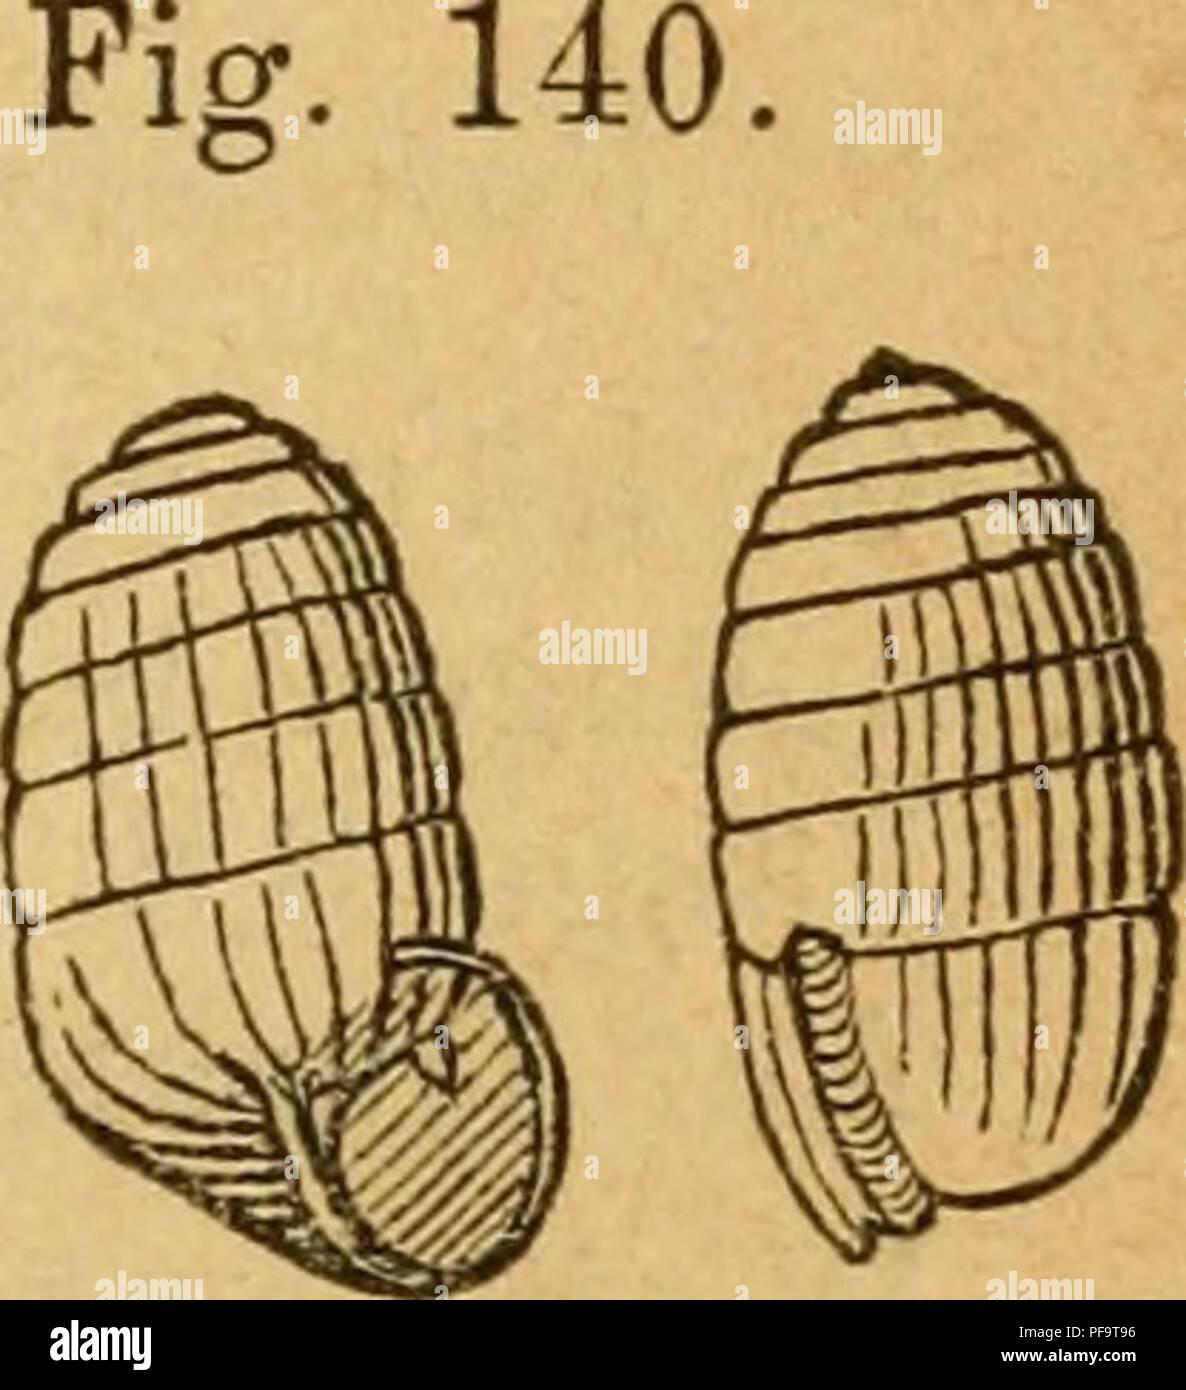 Anatomie Rücken Immagini & Anatomie Rücken Fotos Stock - Alamy